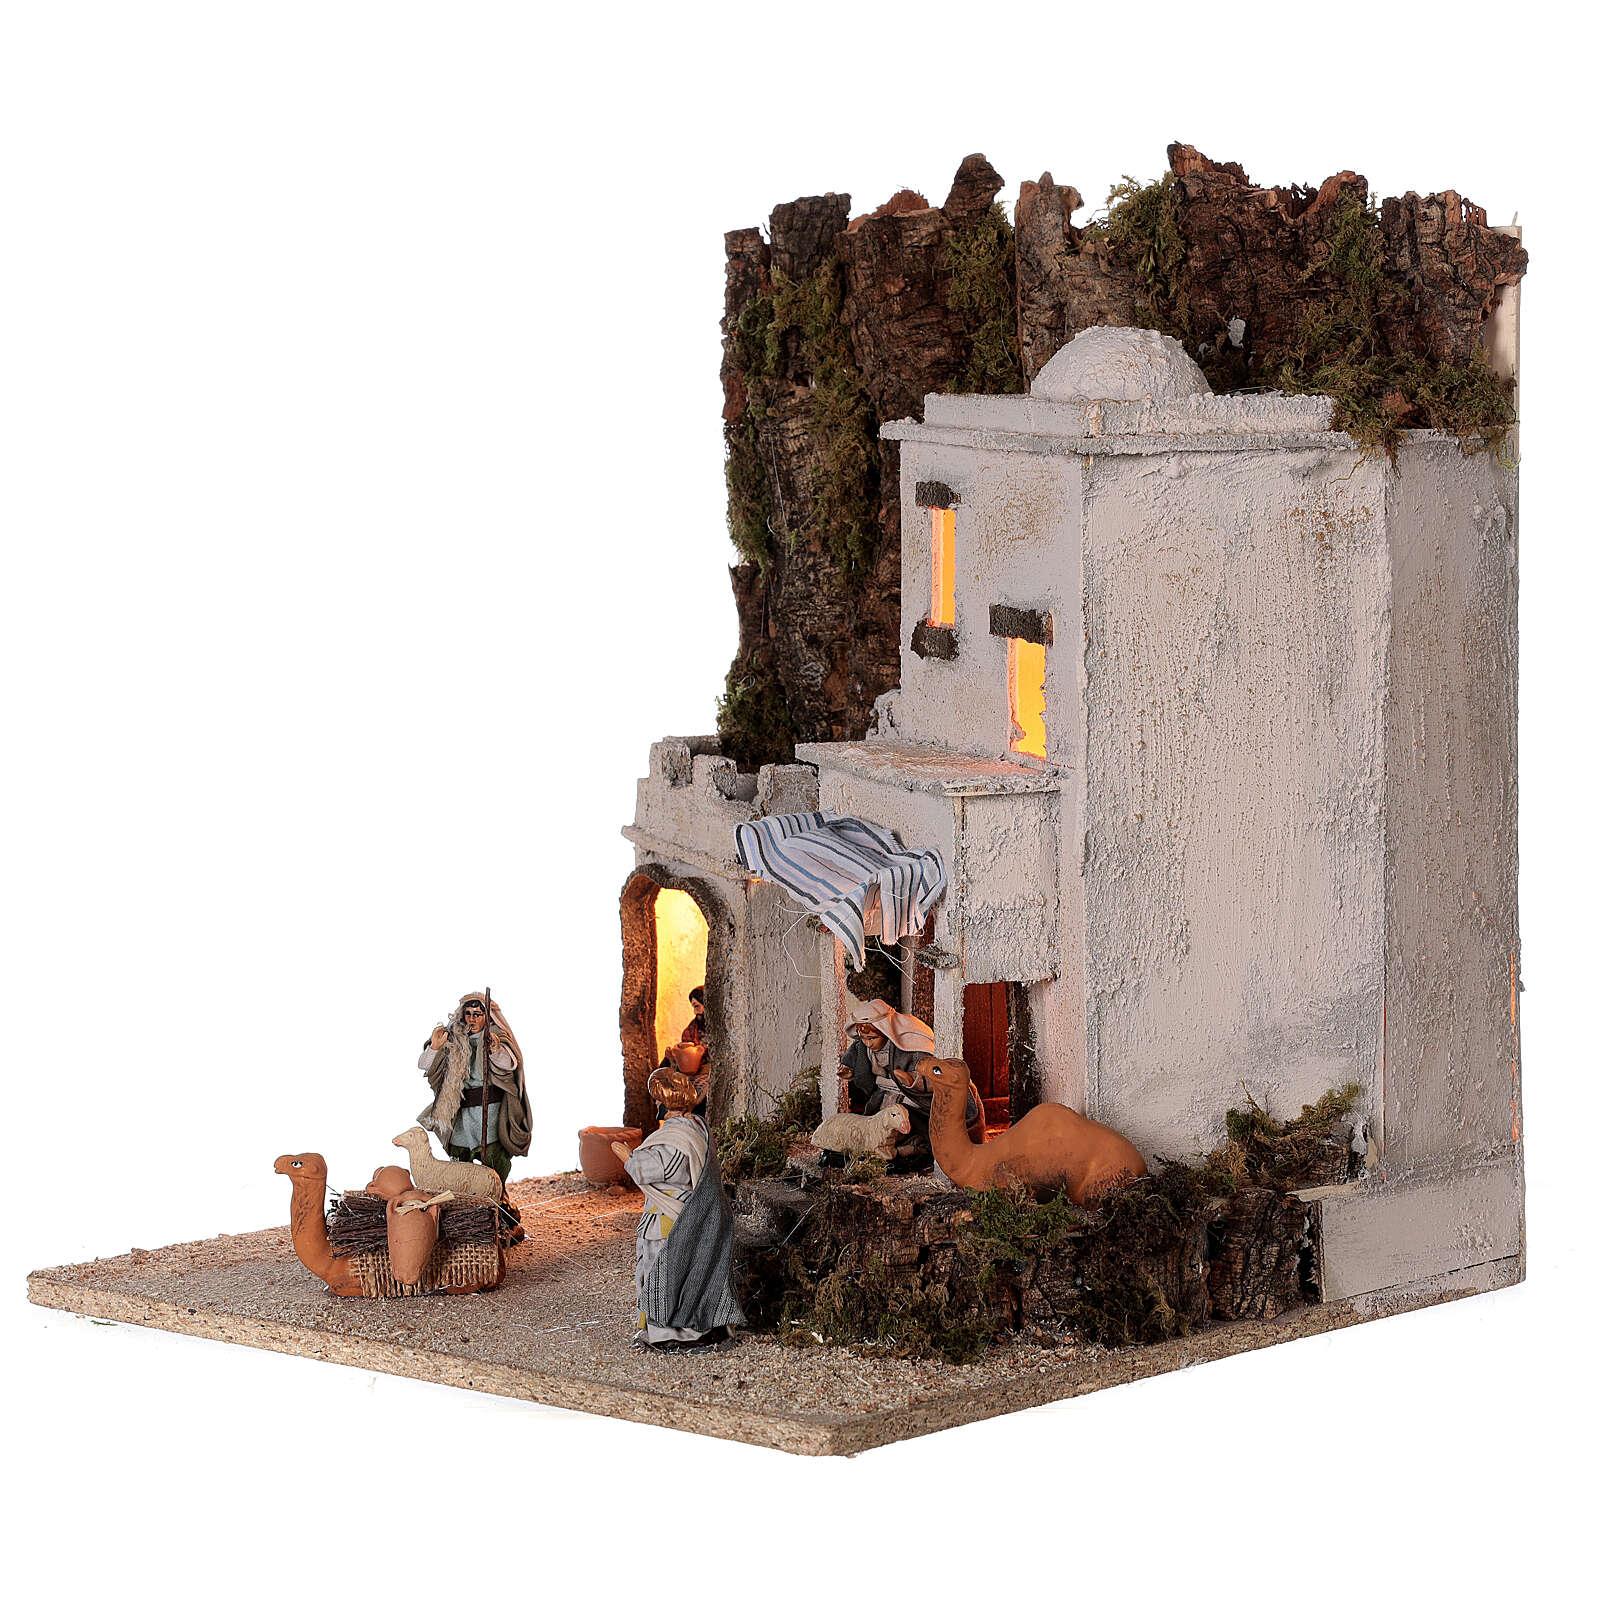 Arab village (F) terracotta figurines and animals 8 cm average height for Neapolitan Nativity Scene 35x35x35 cm 4